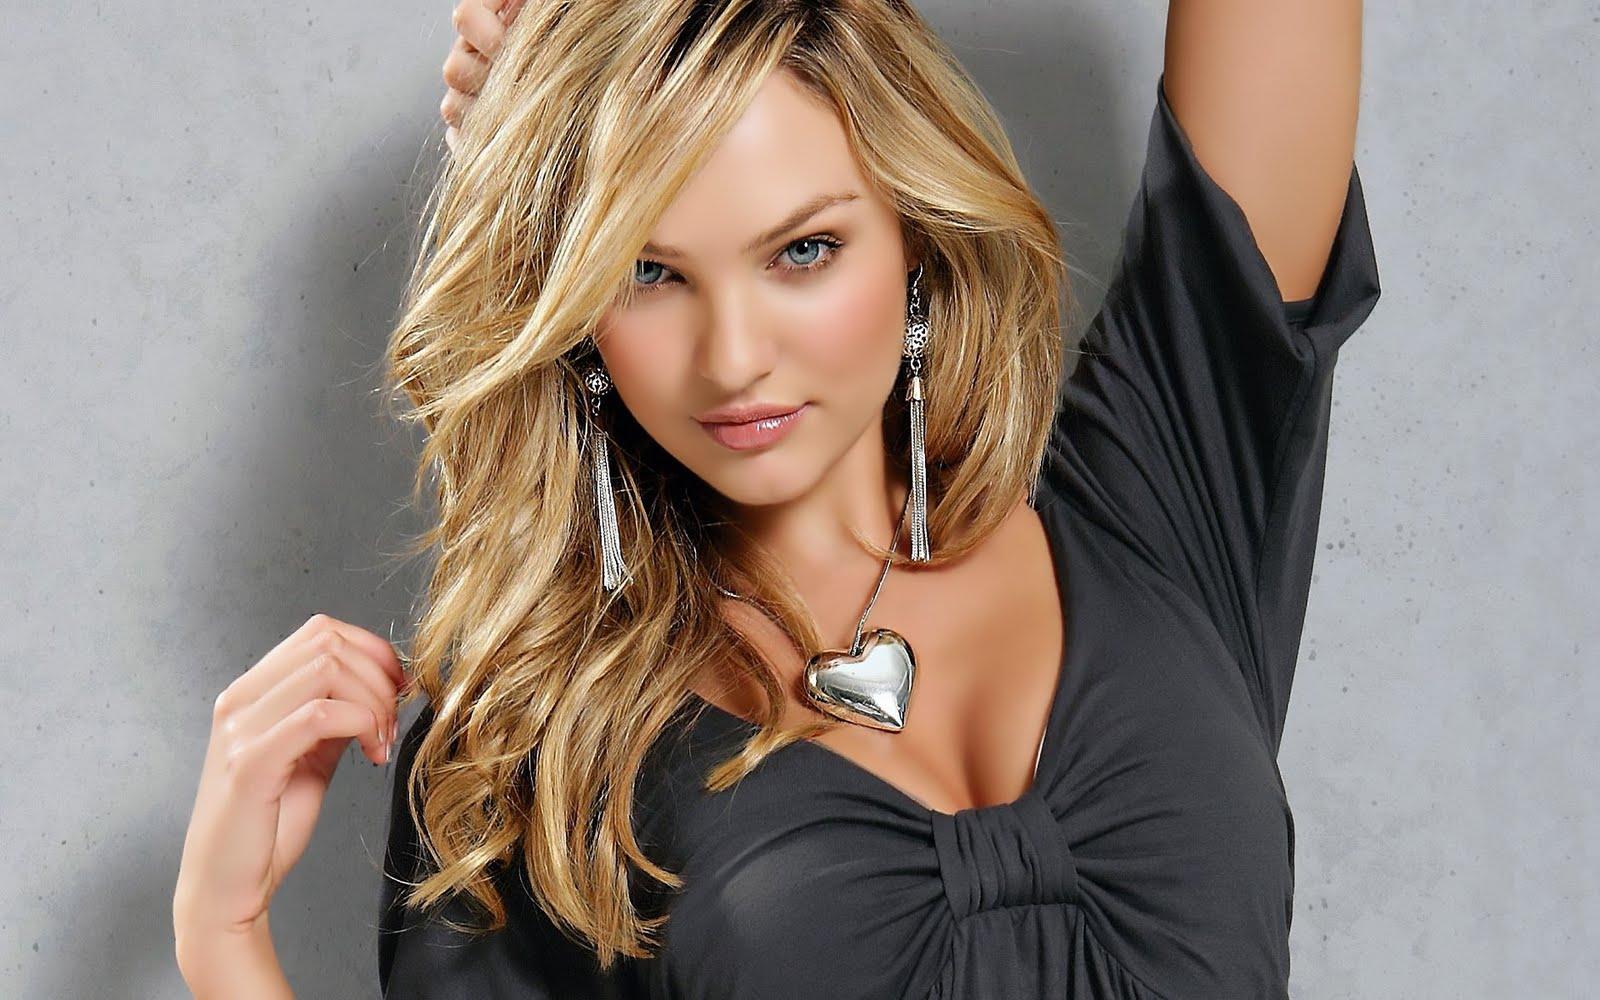 Actress boobs nude